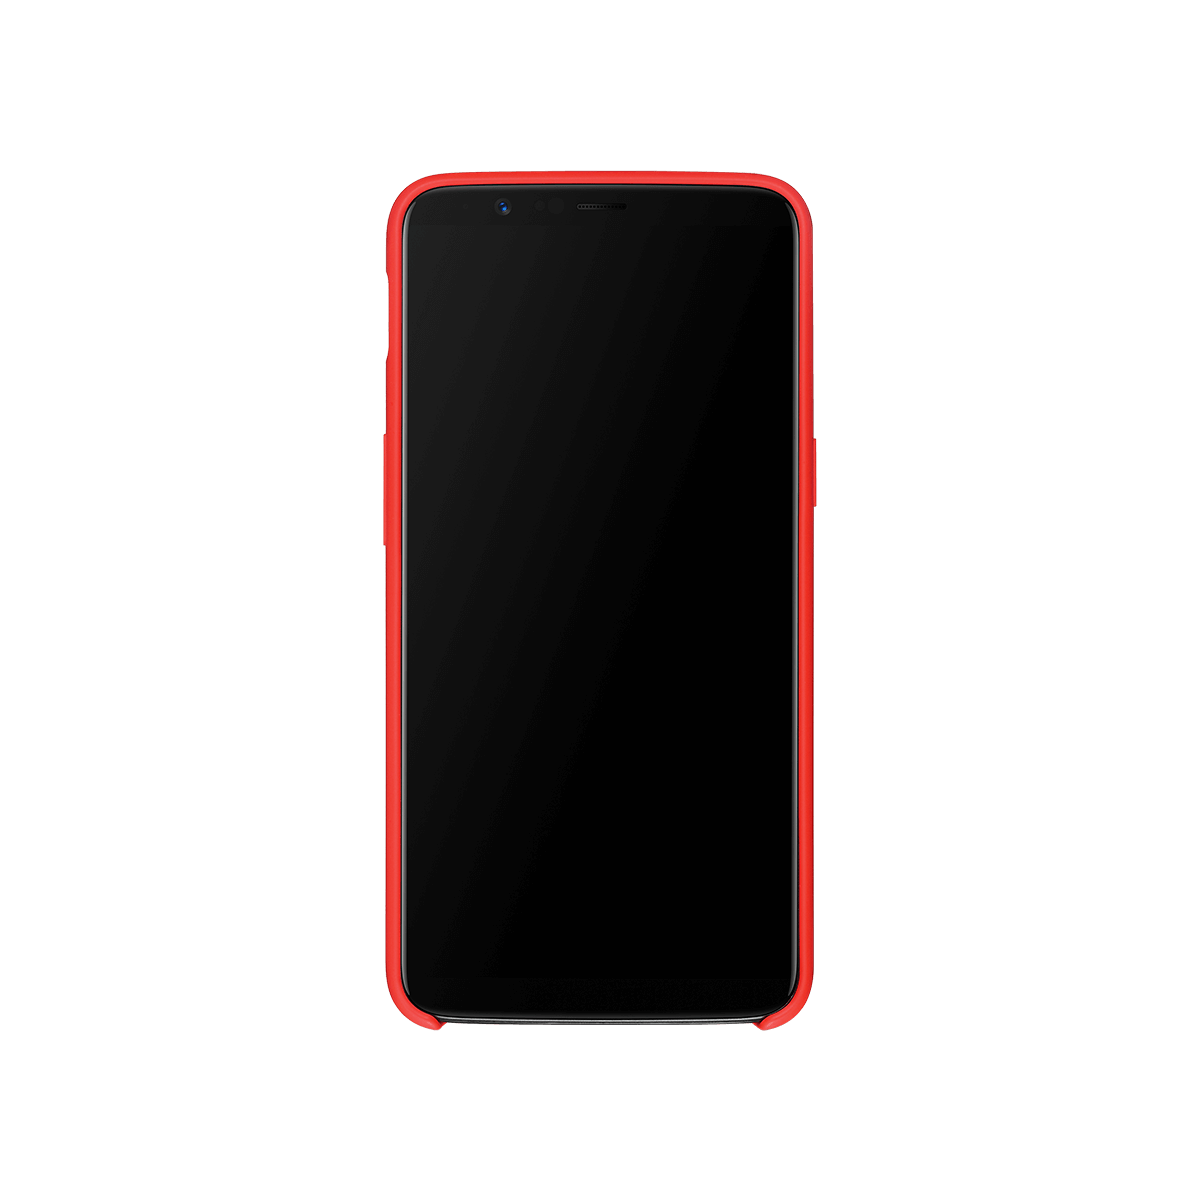 new styles 27d8e 93c4d OnePlus 5T Silicone Protective Case - OnePlus (Magyarország)